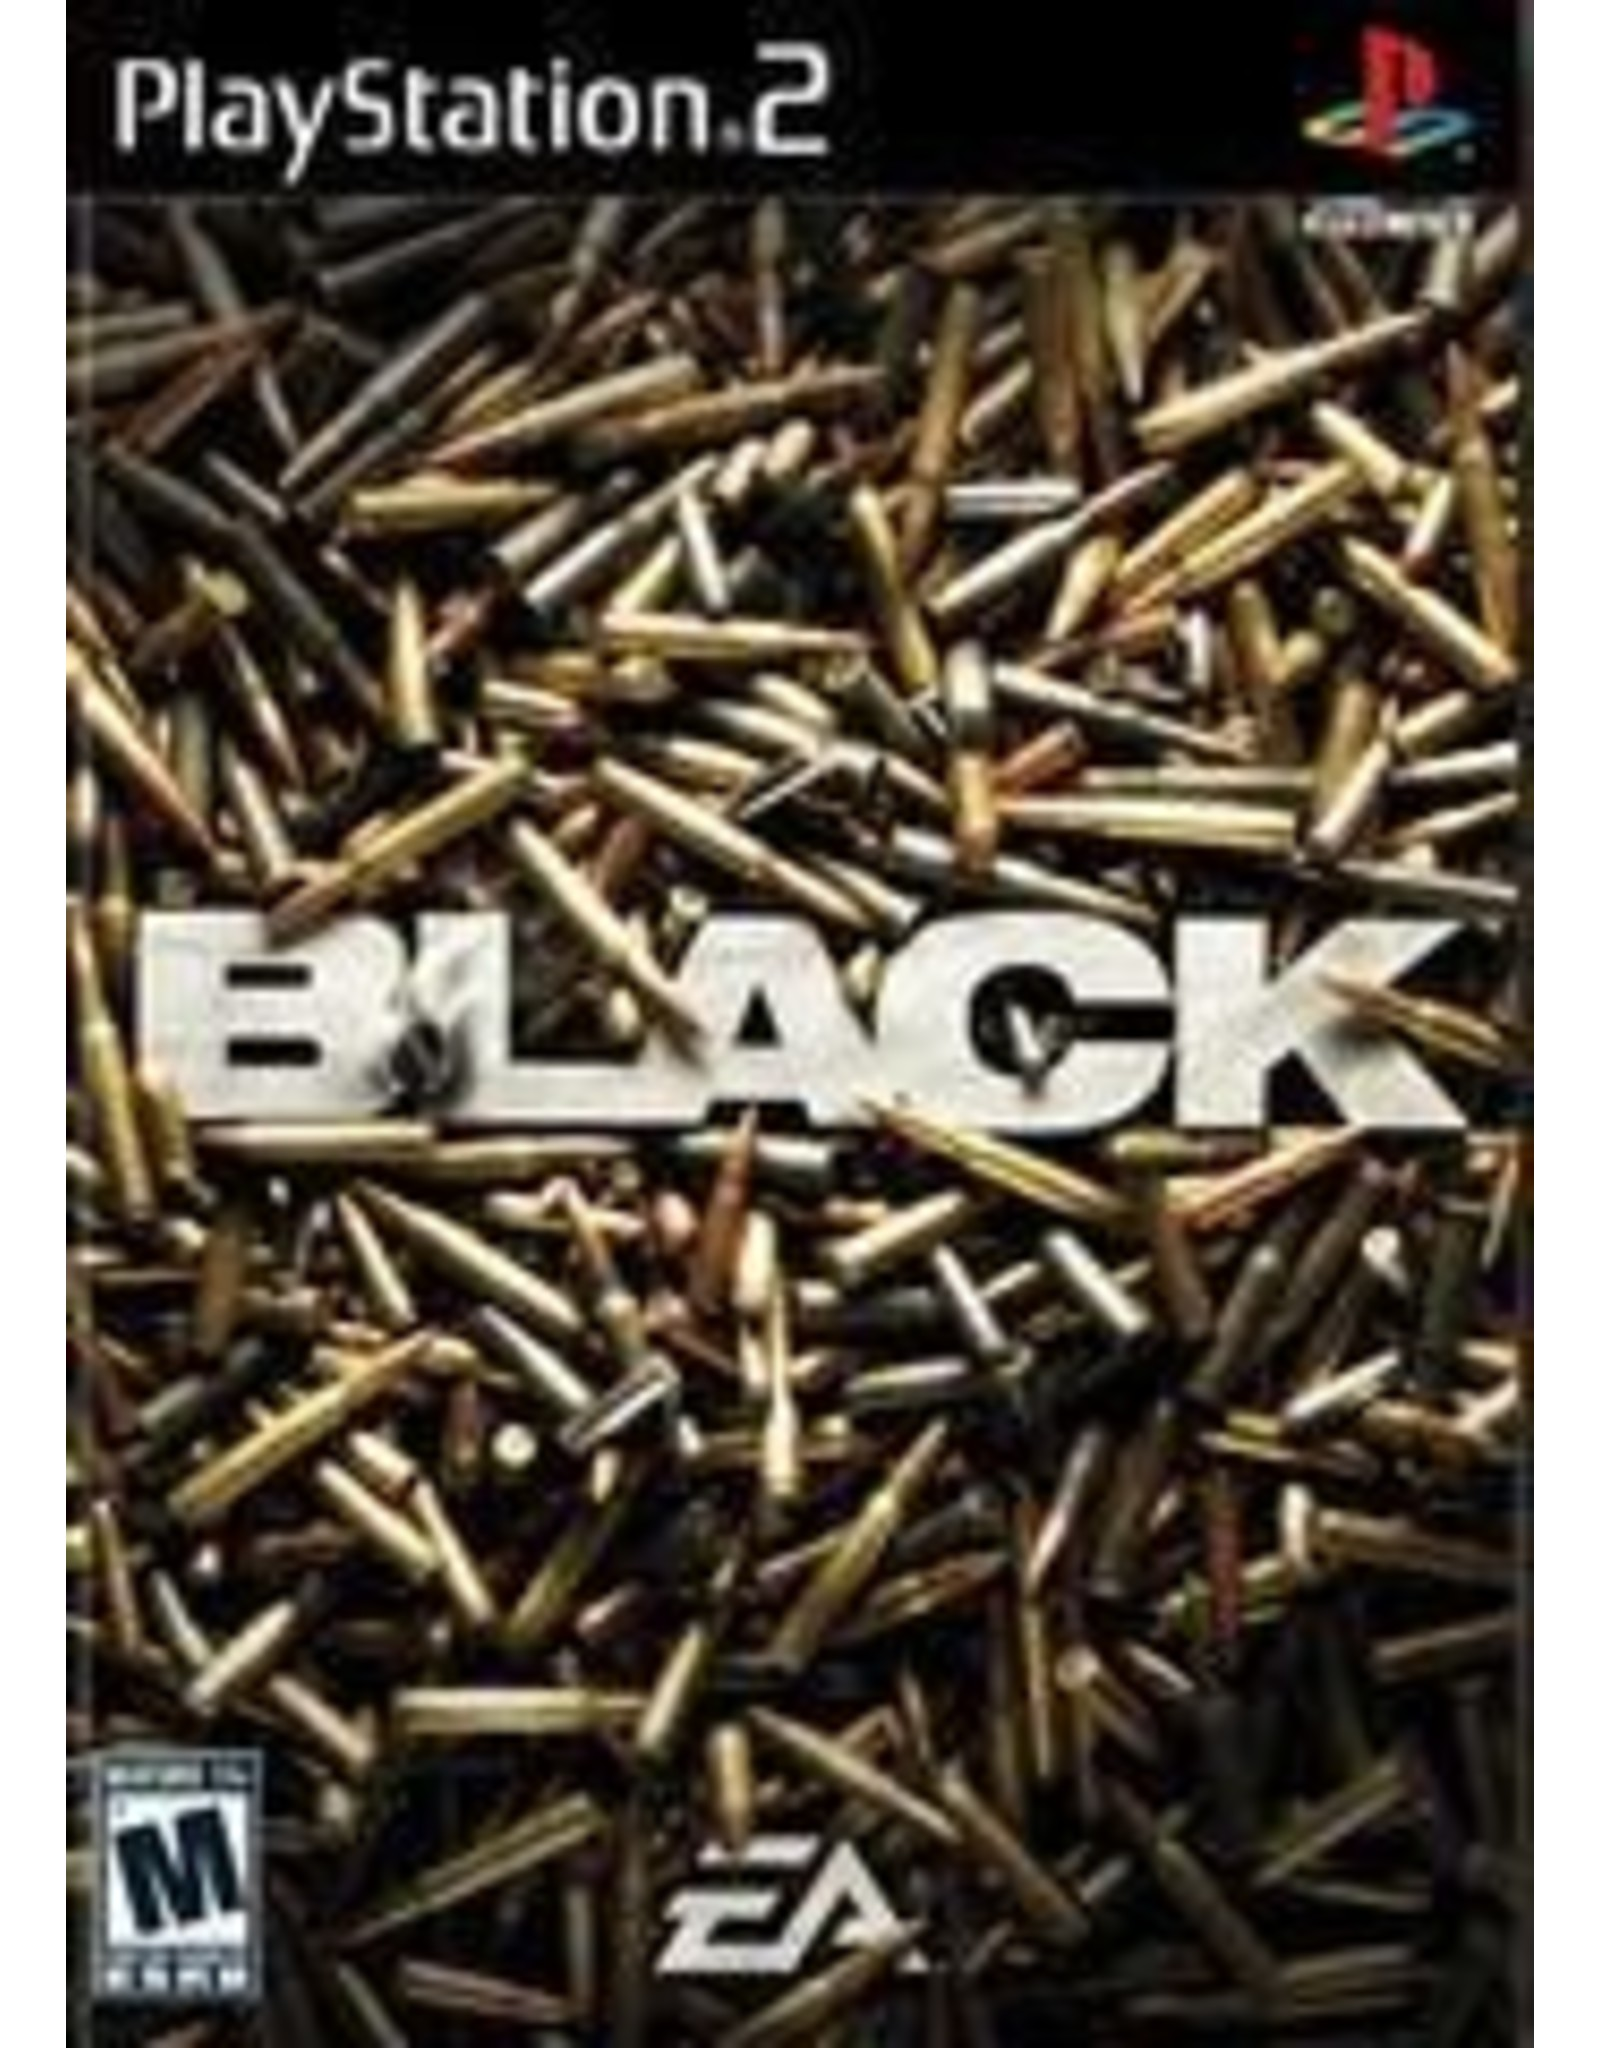 Playstation 2 Black (CiB)